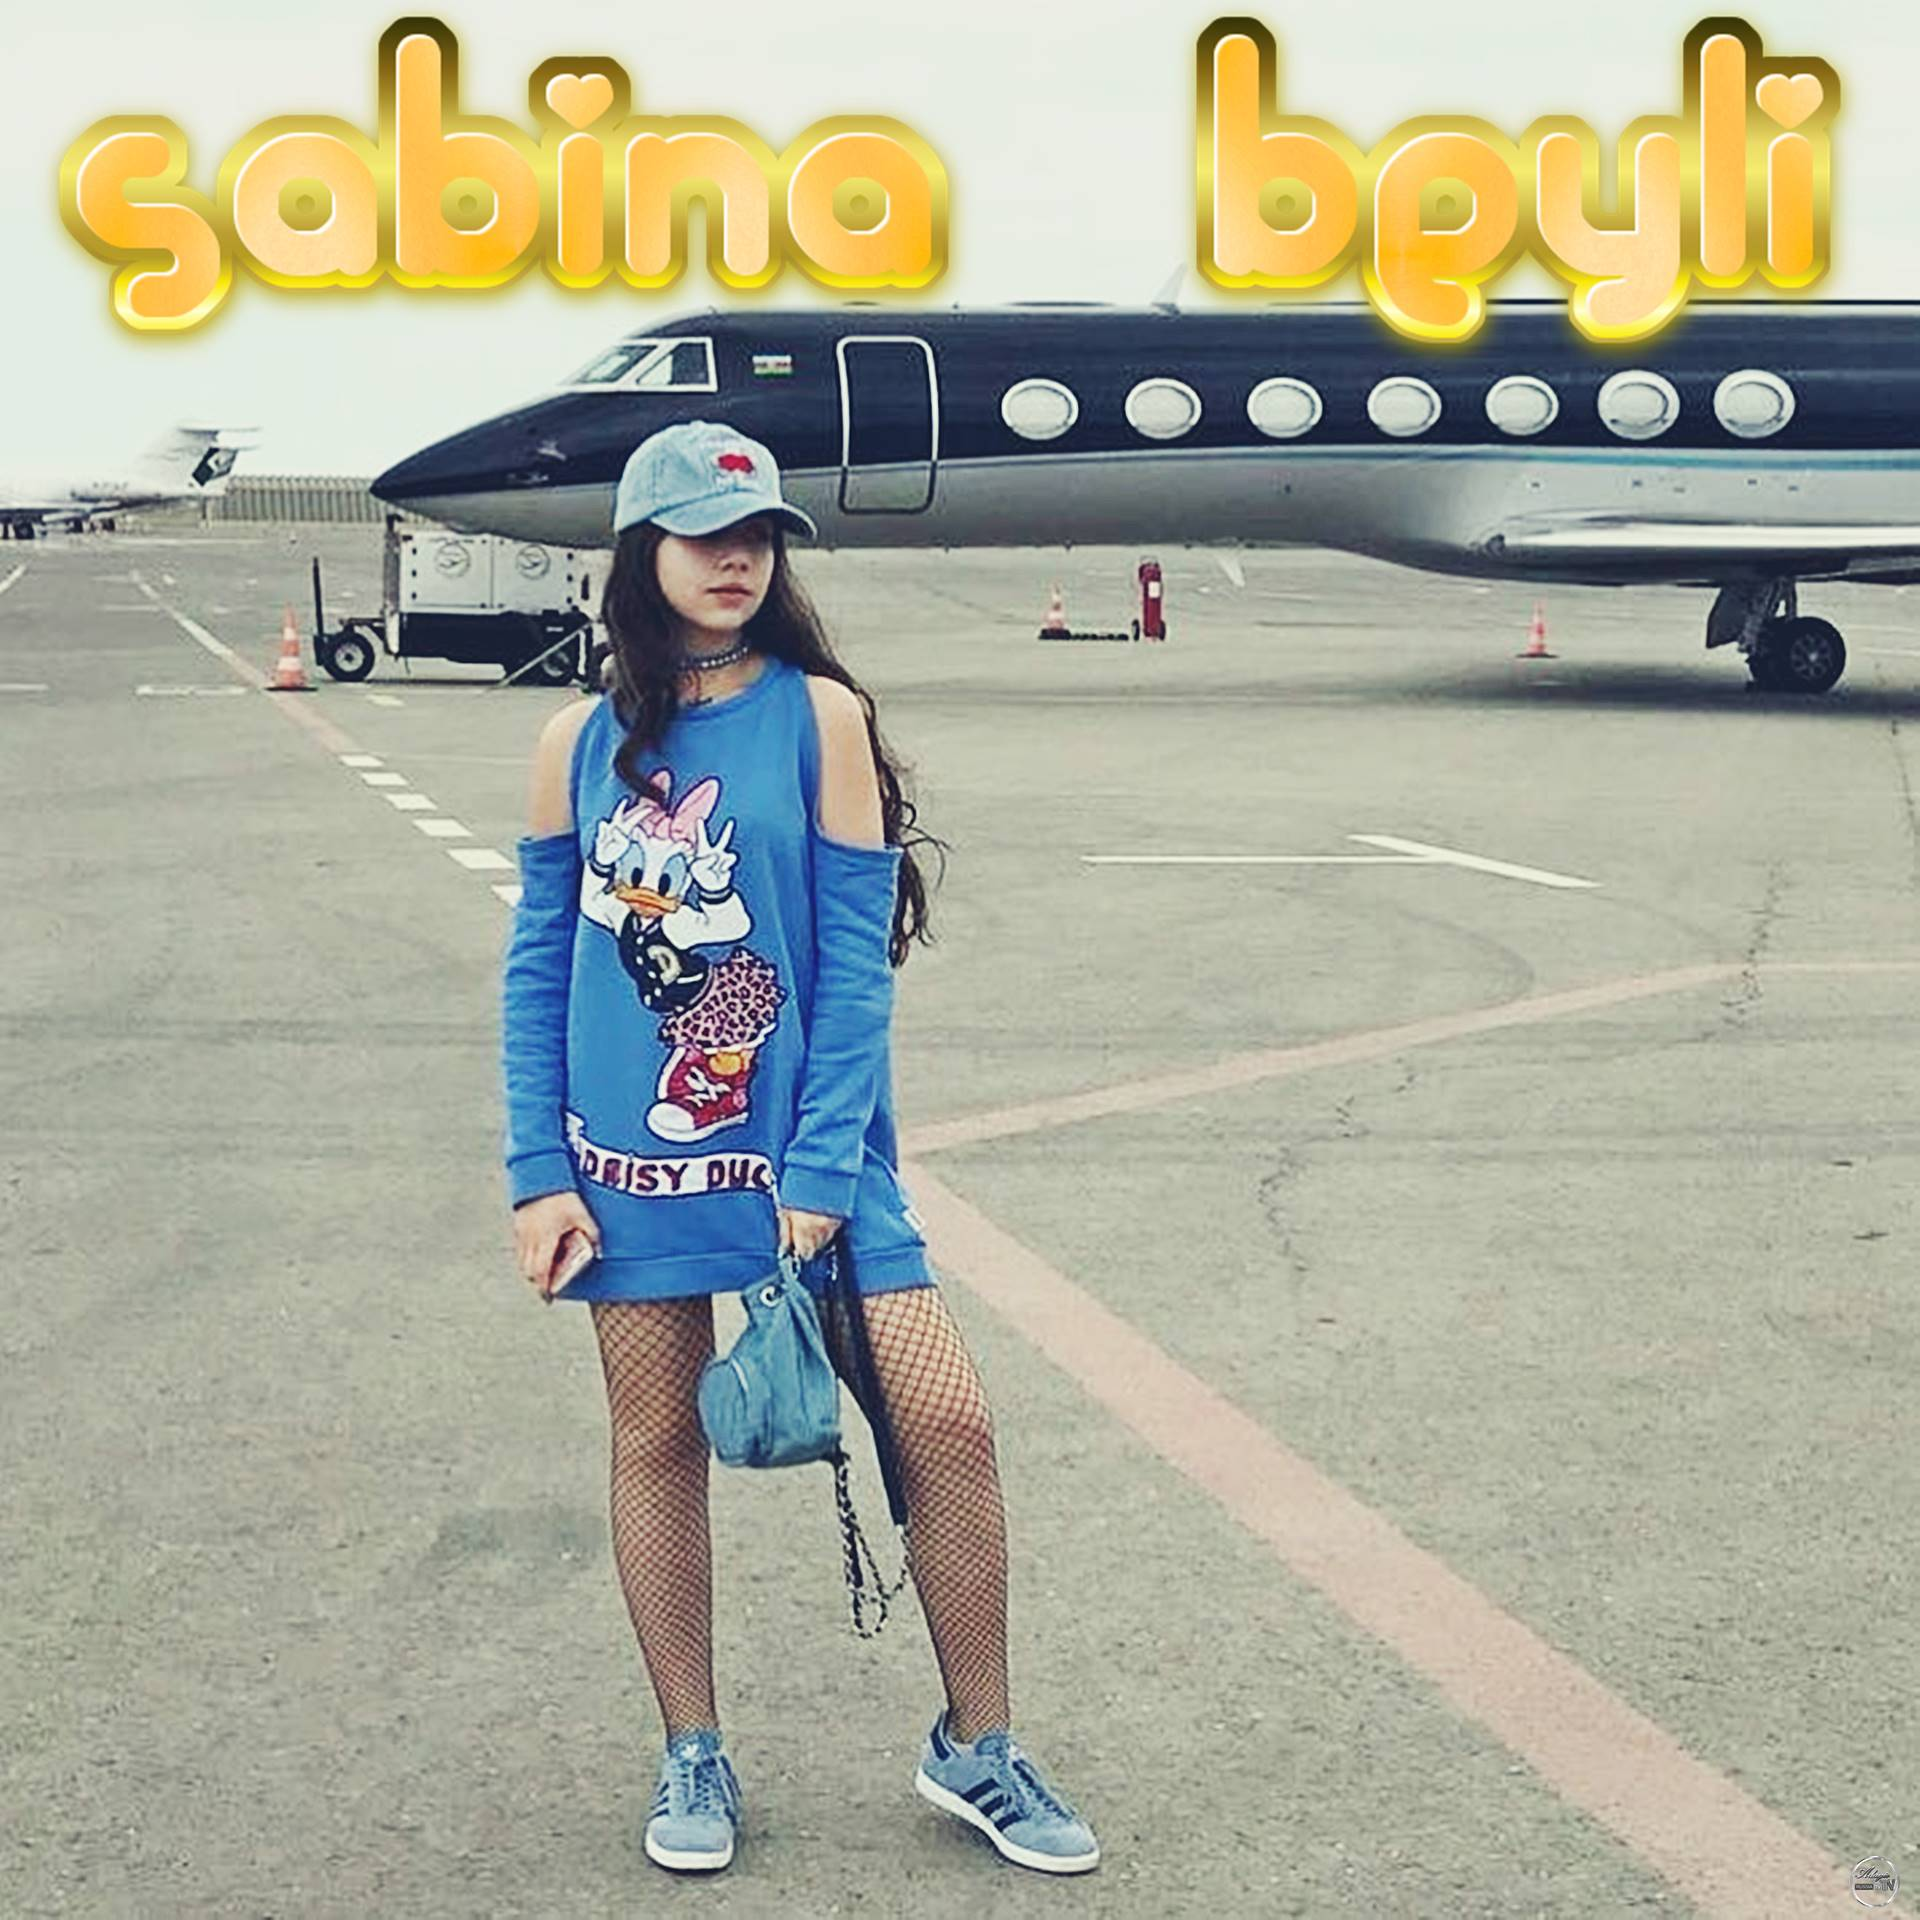 Sabina Beyli